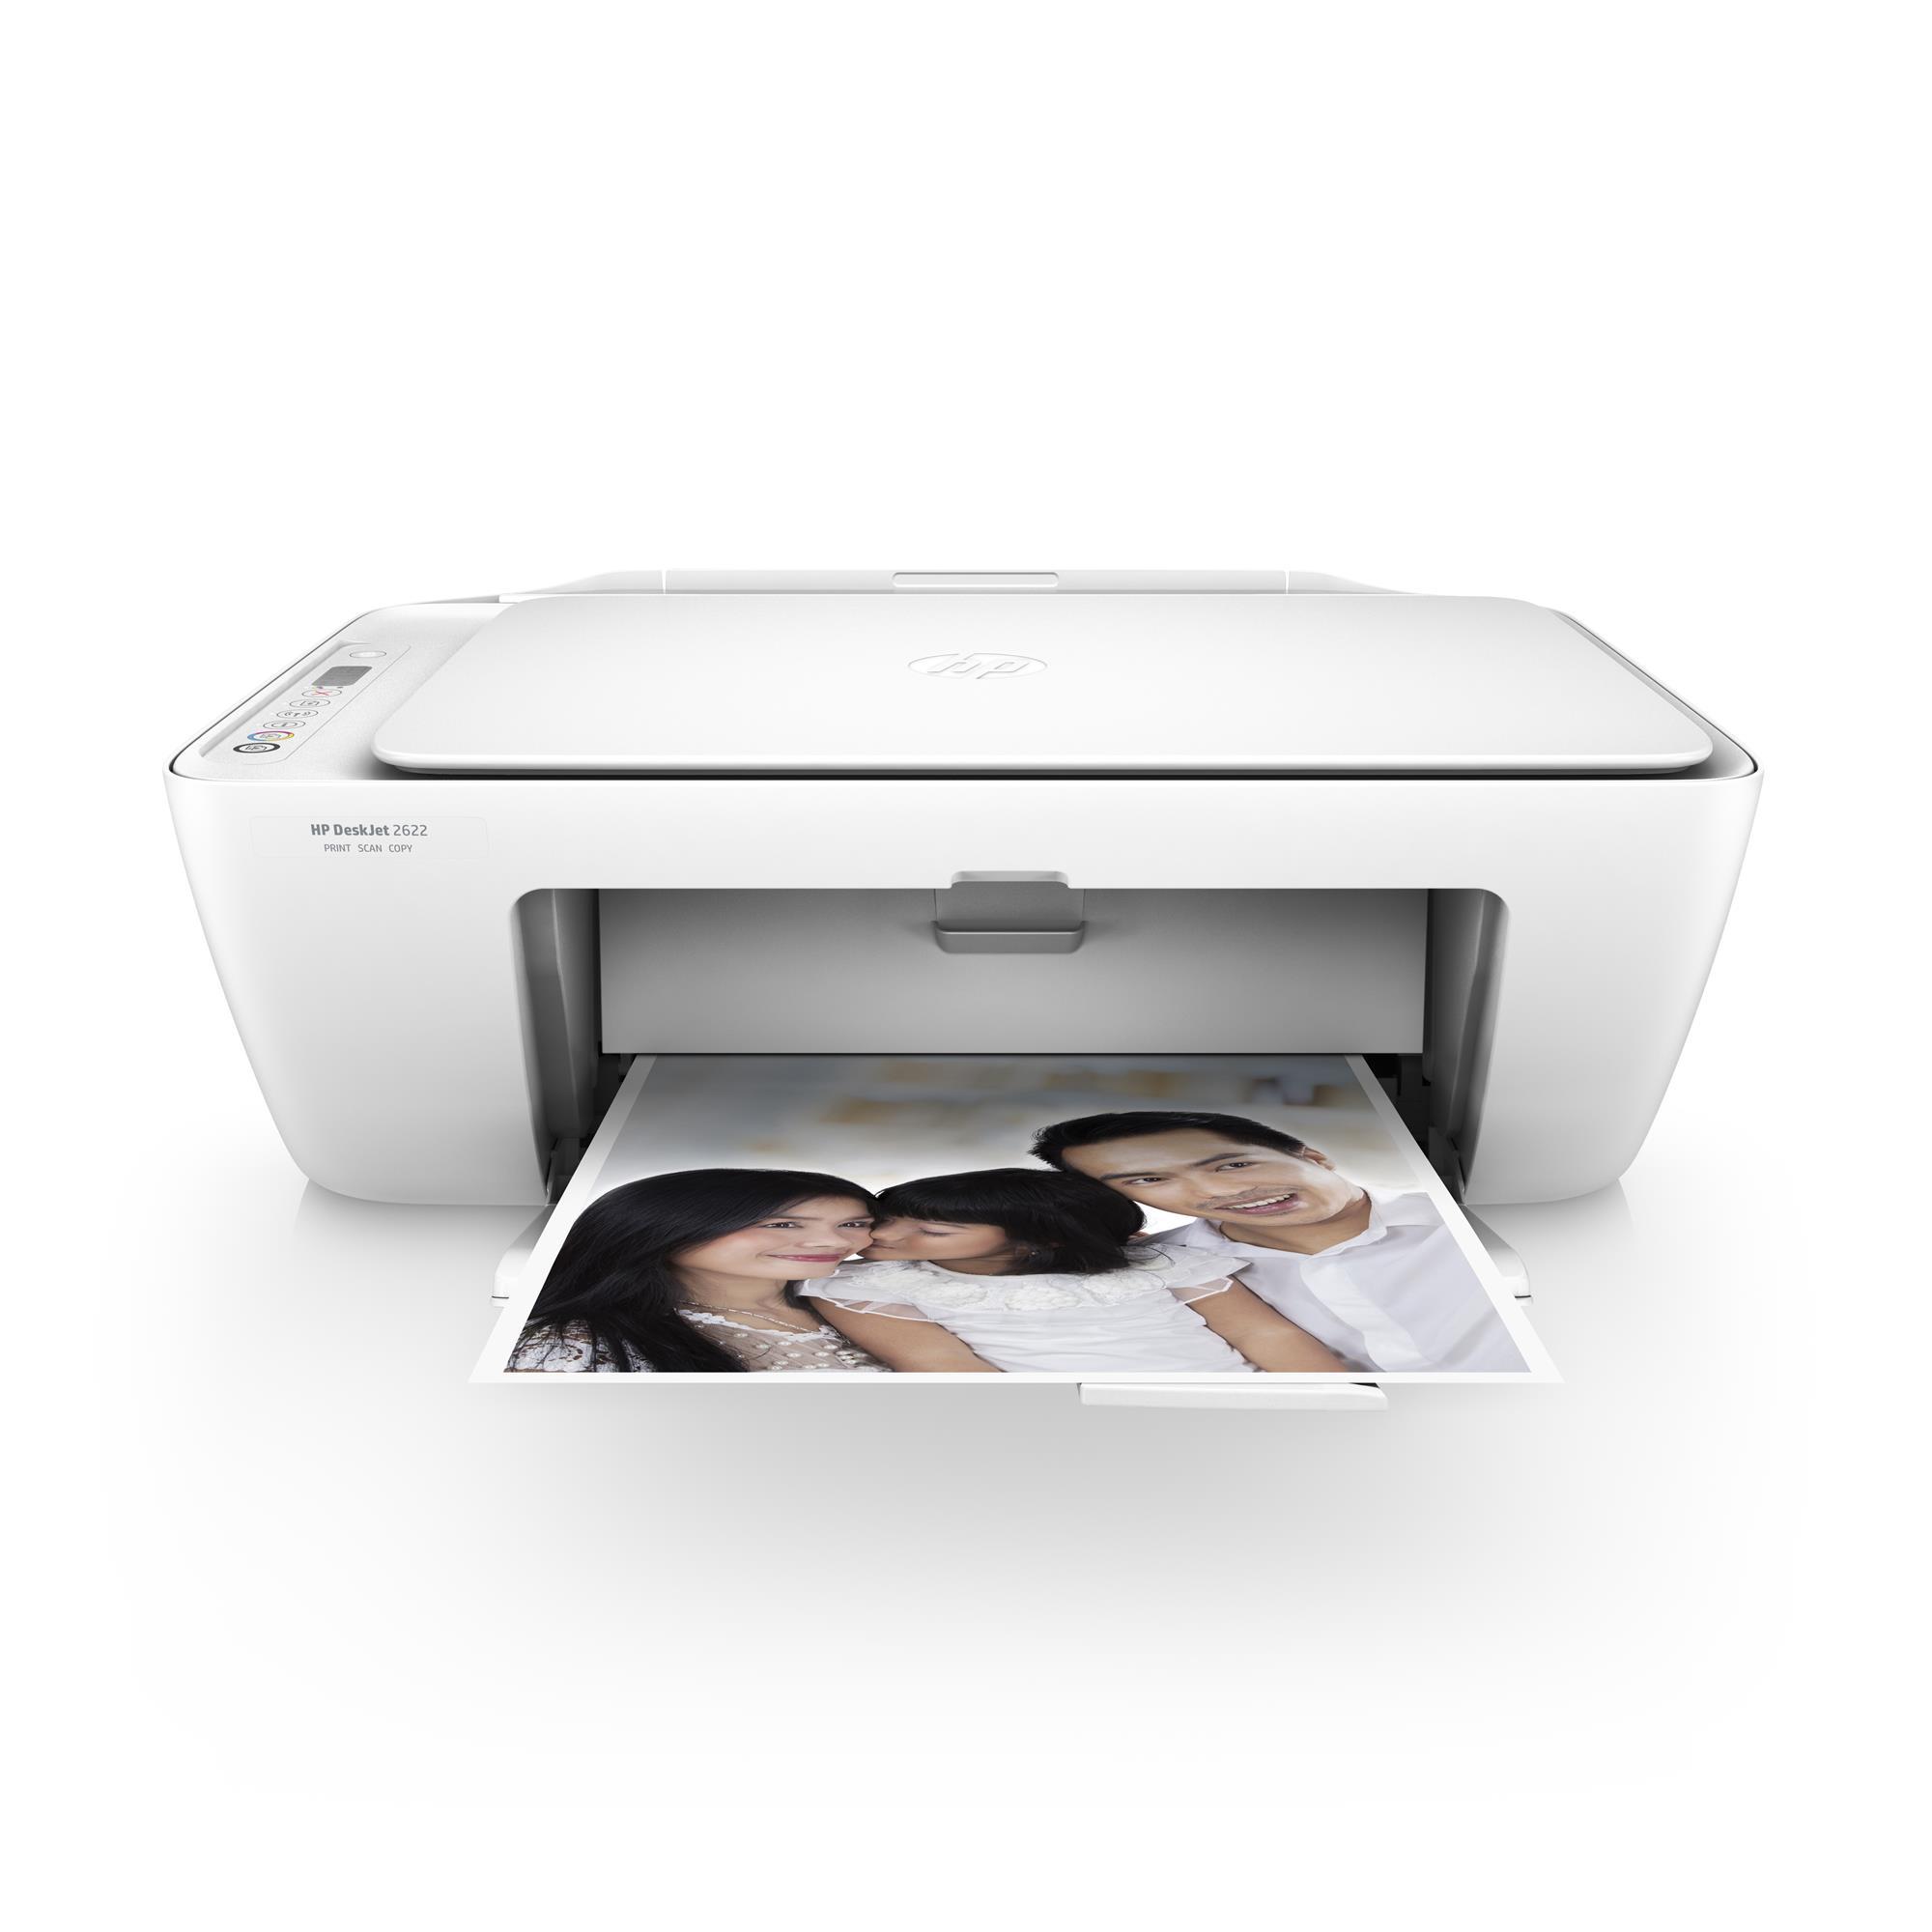 HP 2622 DeskJet All-in-One Original (end 3/23/2019 4:15 PM)